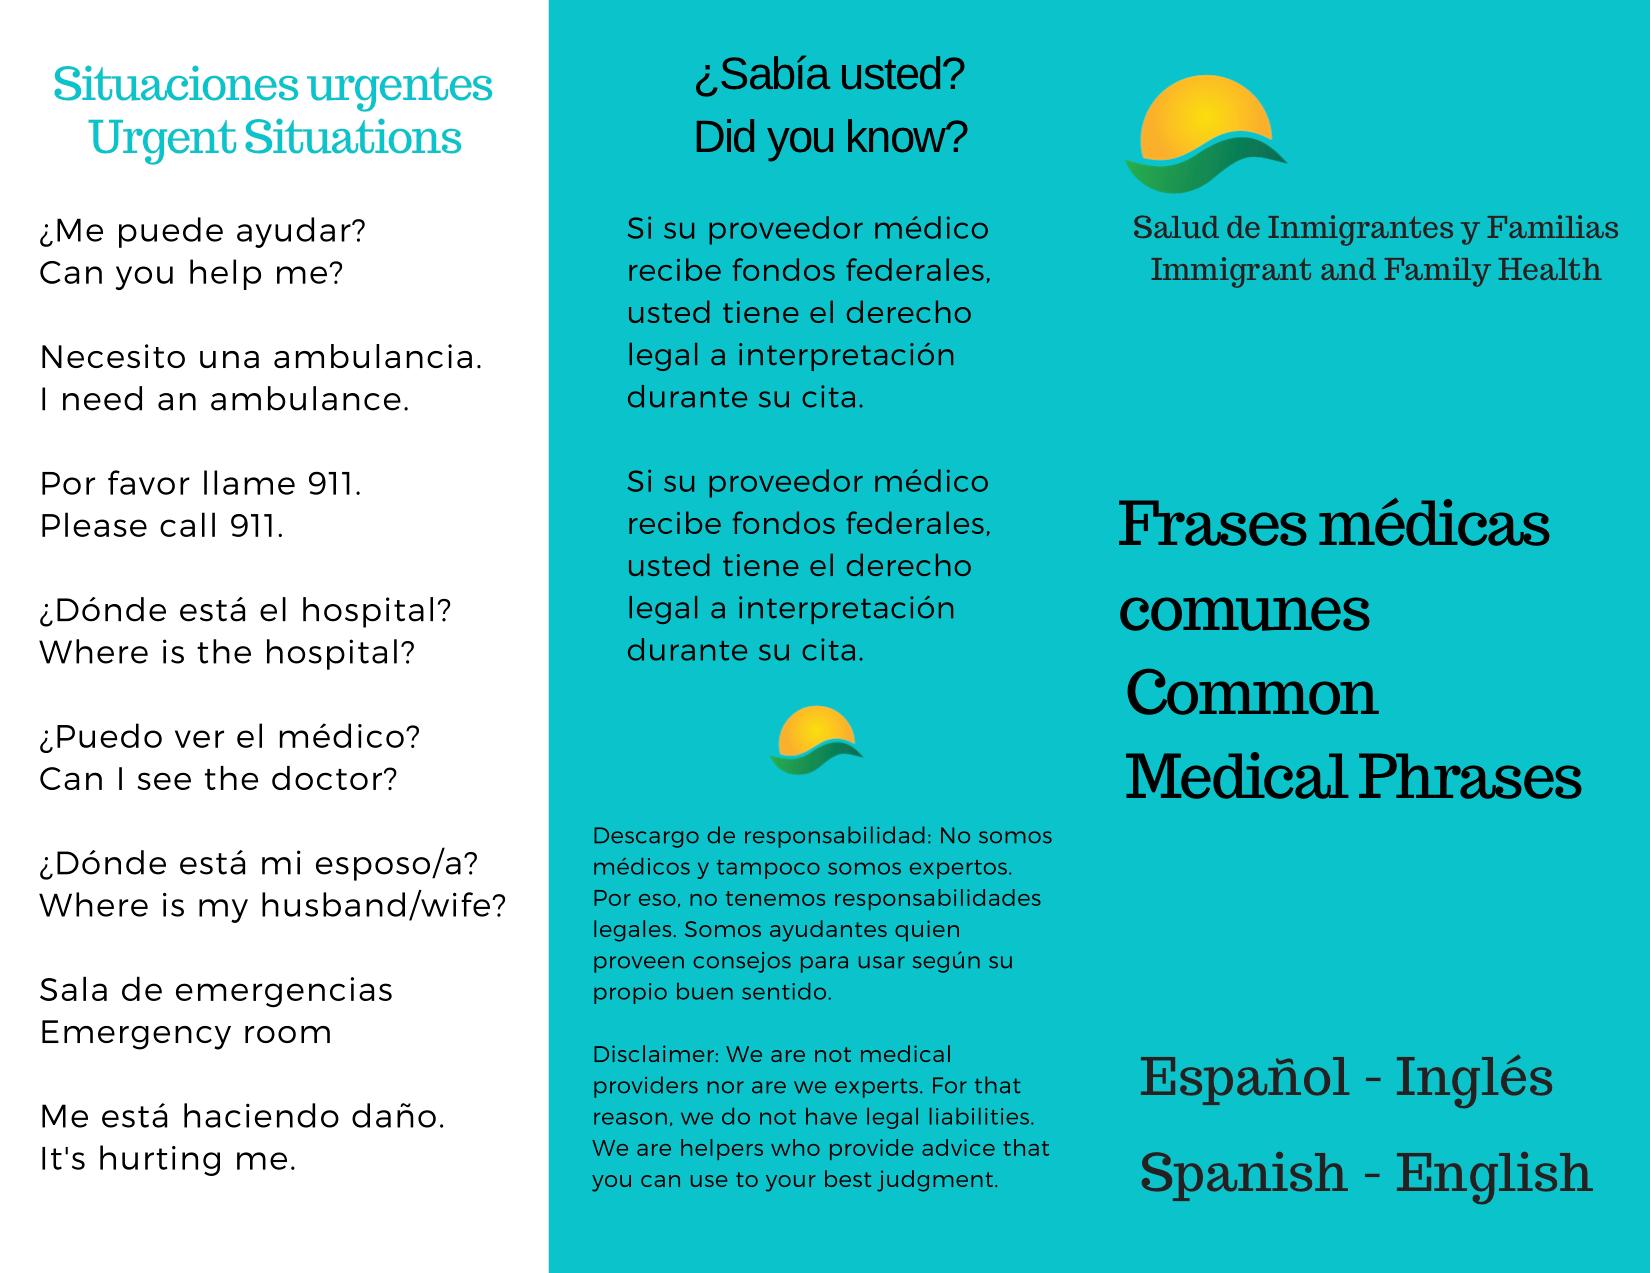 Common Medical Phrases for Urgent Situations (Frases comunes para situaciones médicas urgentes)